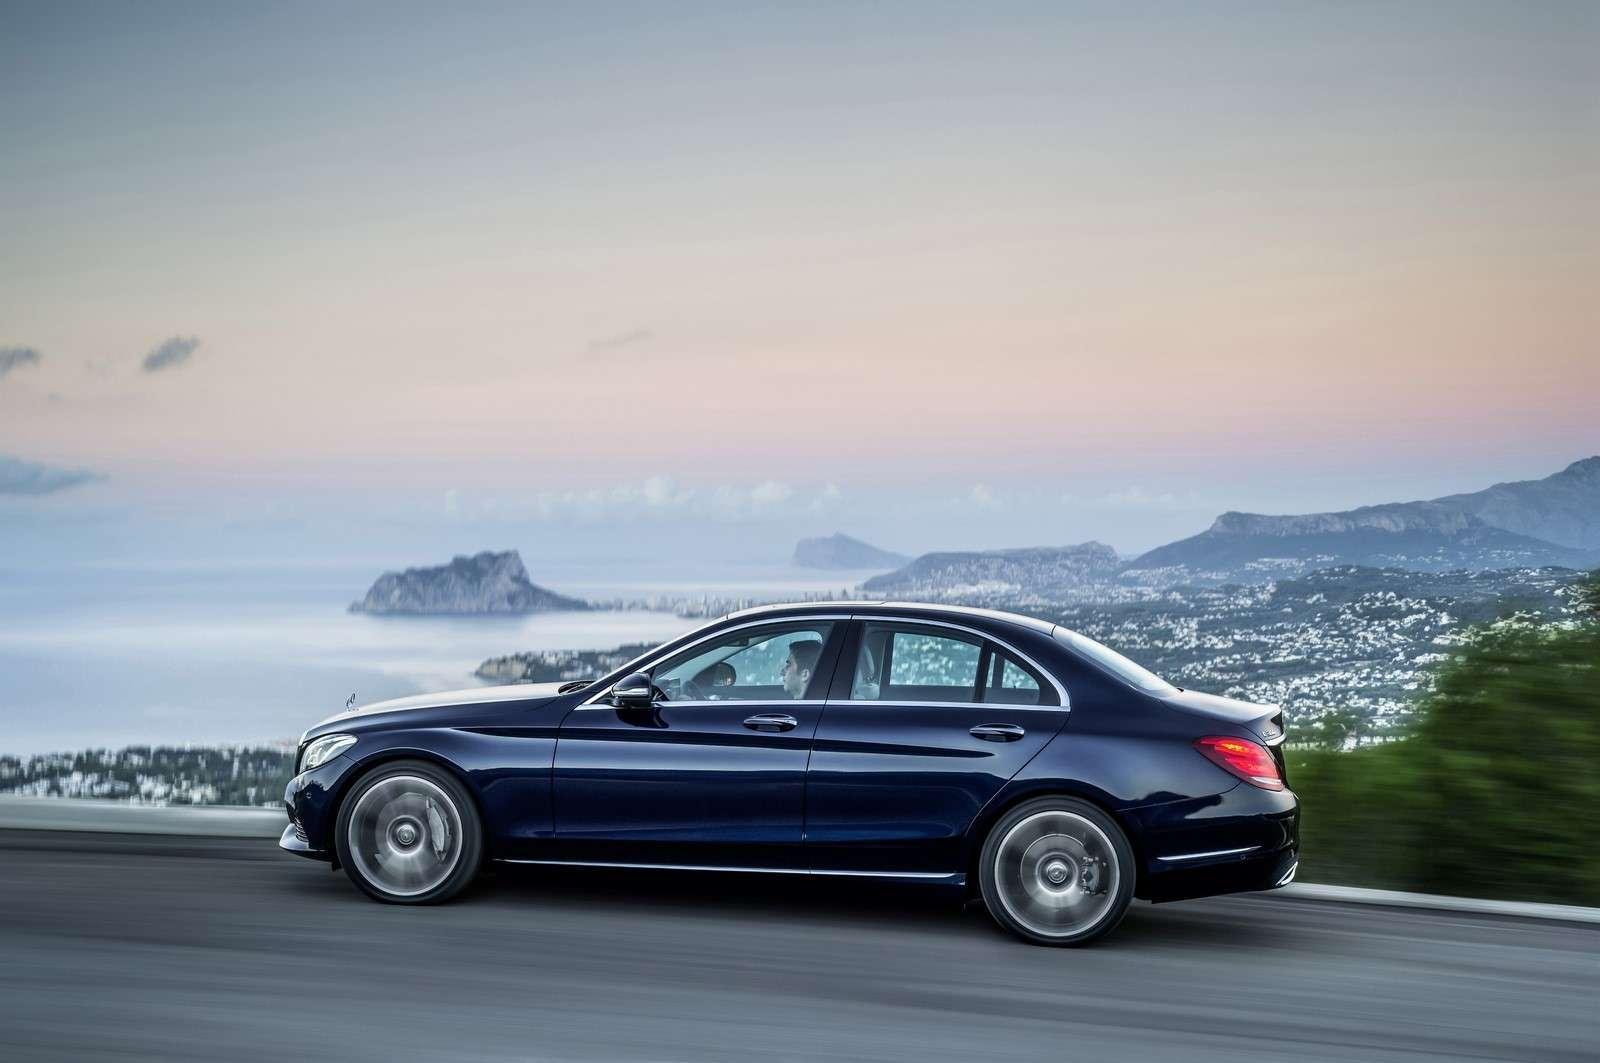 Mercedes-Benz C 300 BlueTEC HYBRID, Exclusive Line, Cavansitblau metallic, Leder ARTICOKristallgrau/Tiefseeblau, Zierelemente Holz Linde linestructure, (W205),2013